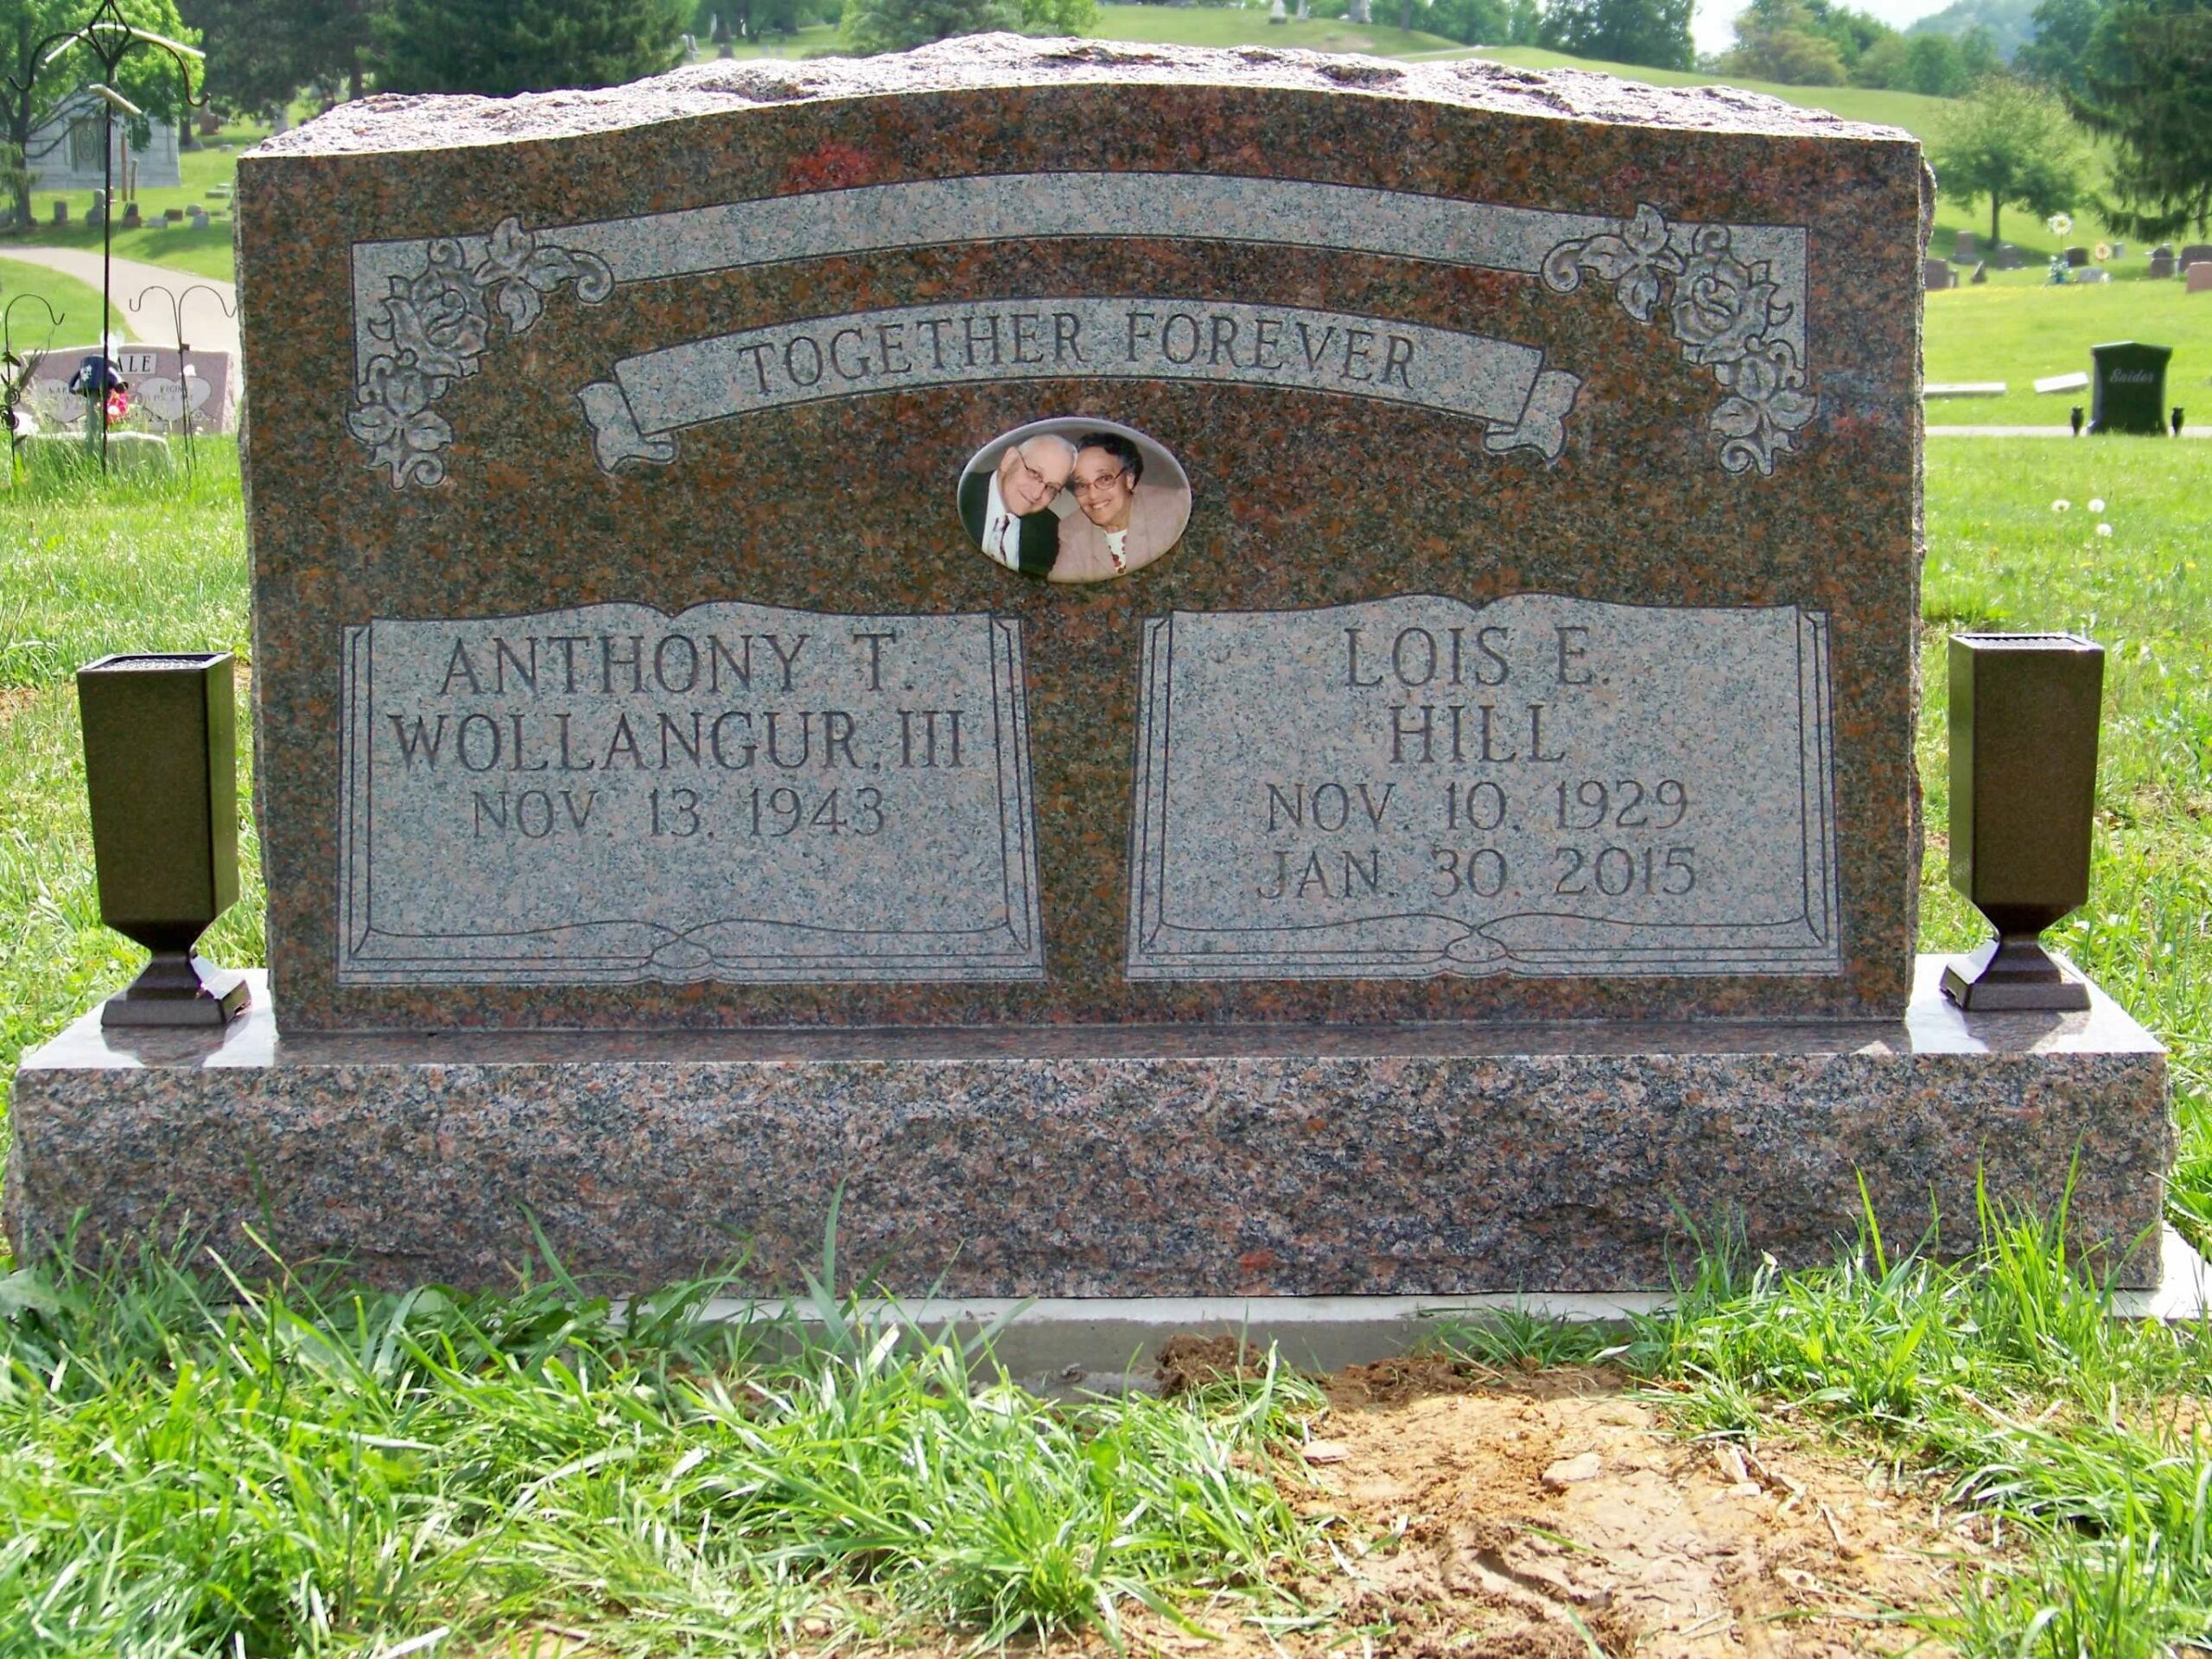 Wollangur, Anthony